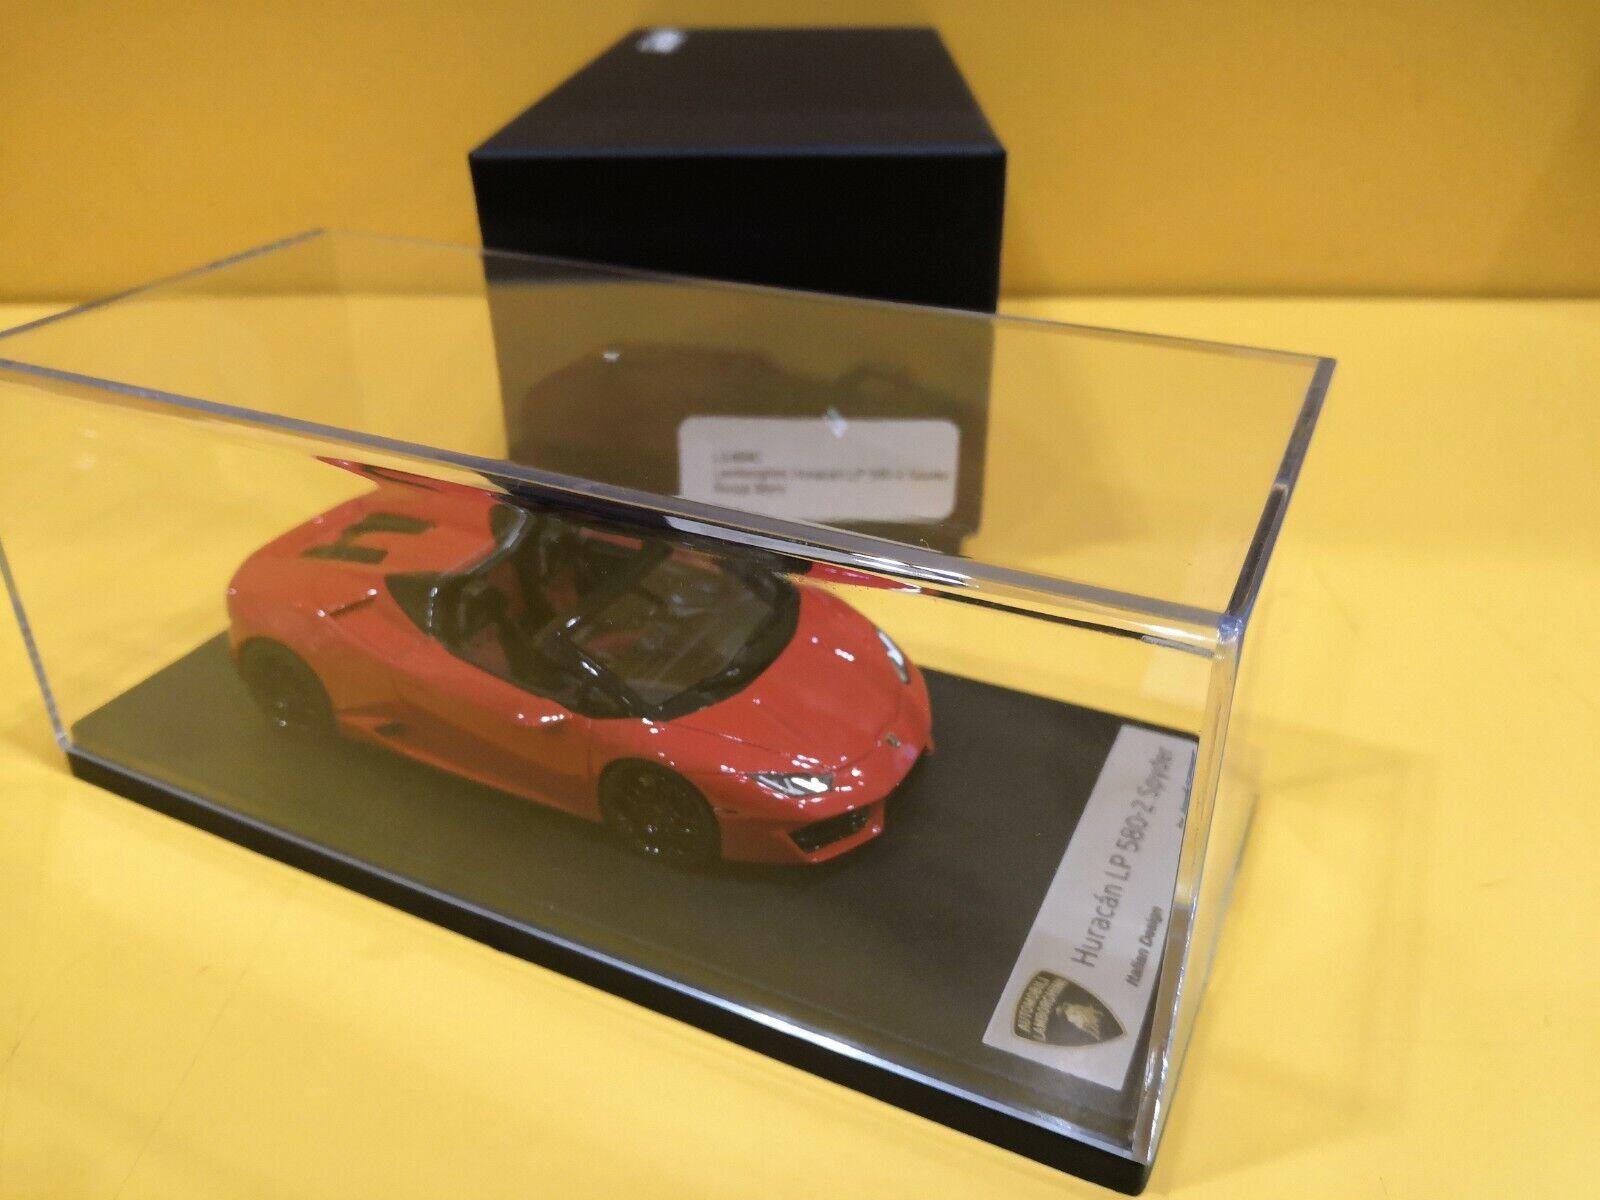 deportes calientes Look Smart LS464C - Lamborghini Lamborghini Lamborghini Huracan LP580-2 Spyder  con 60% de descuento